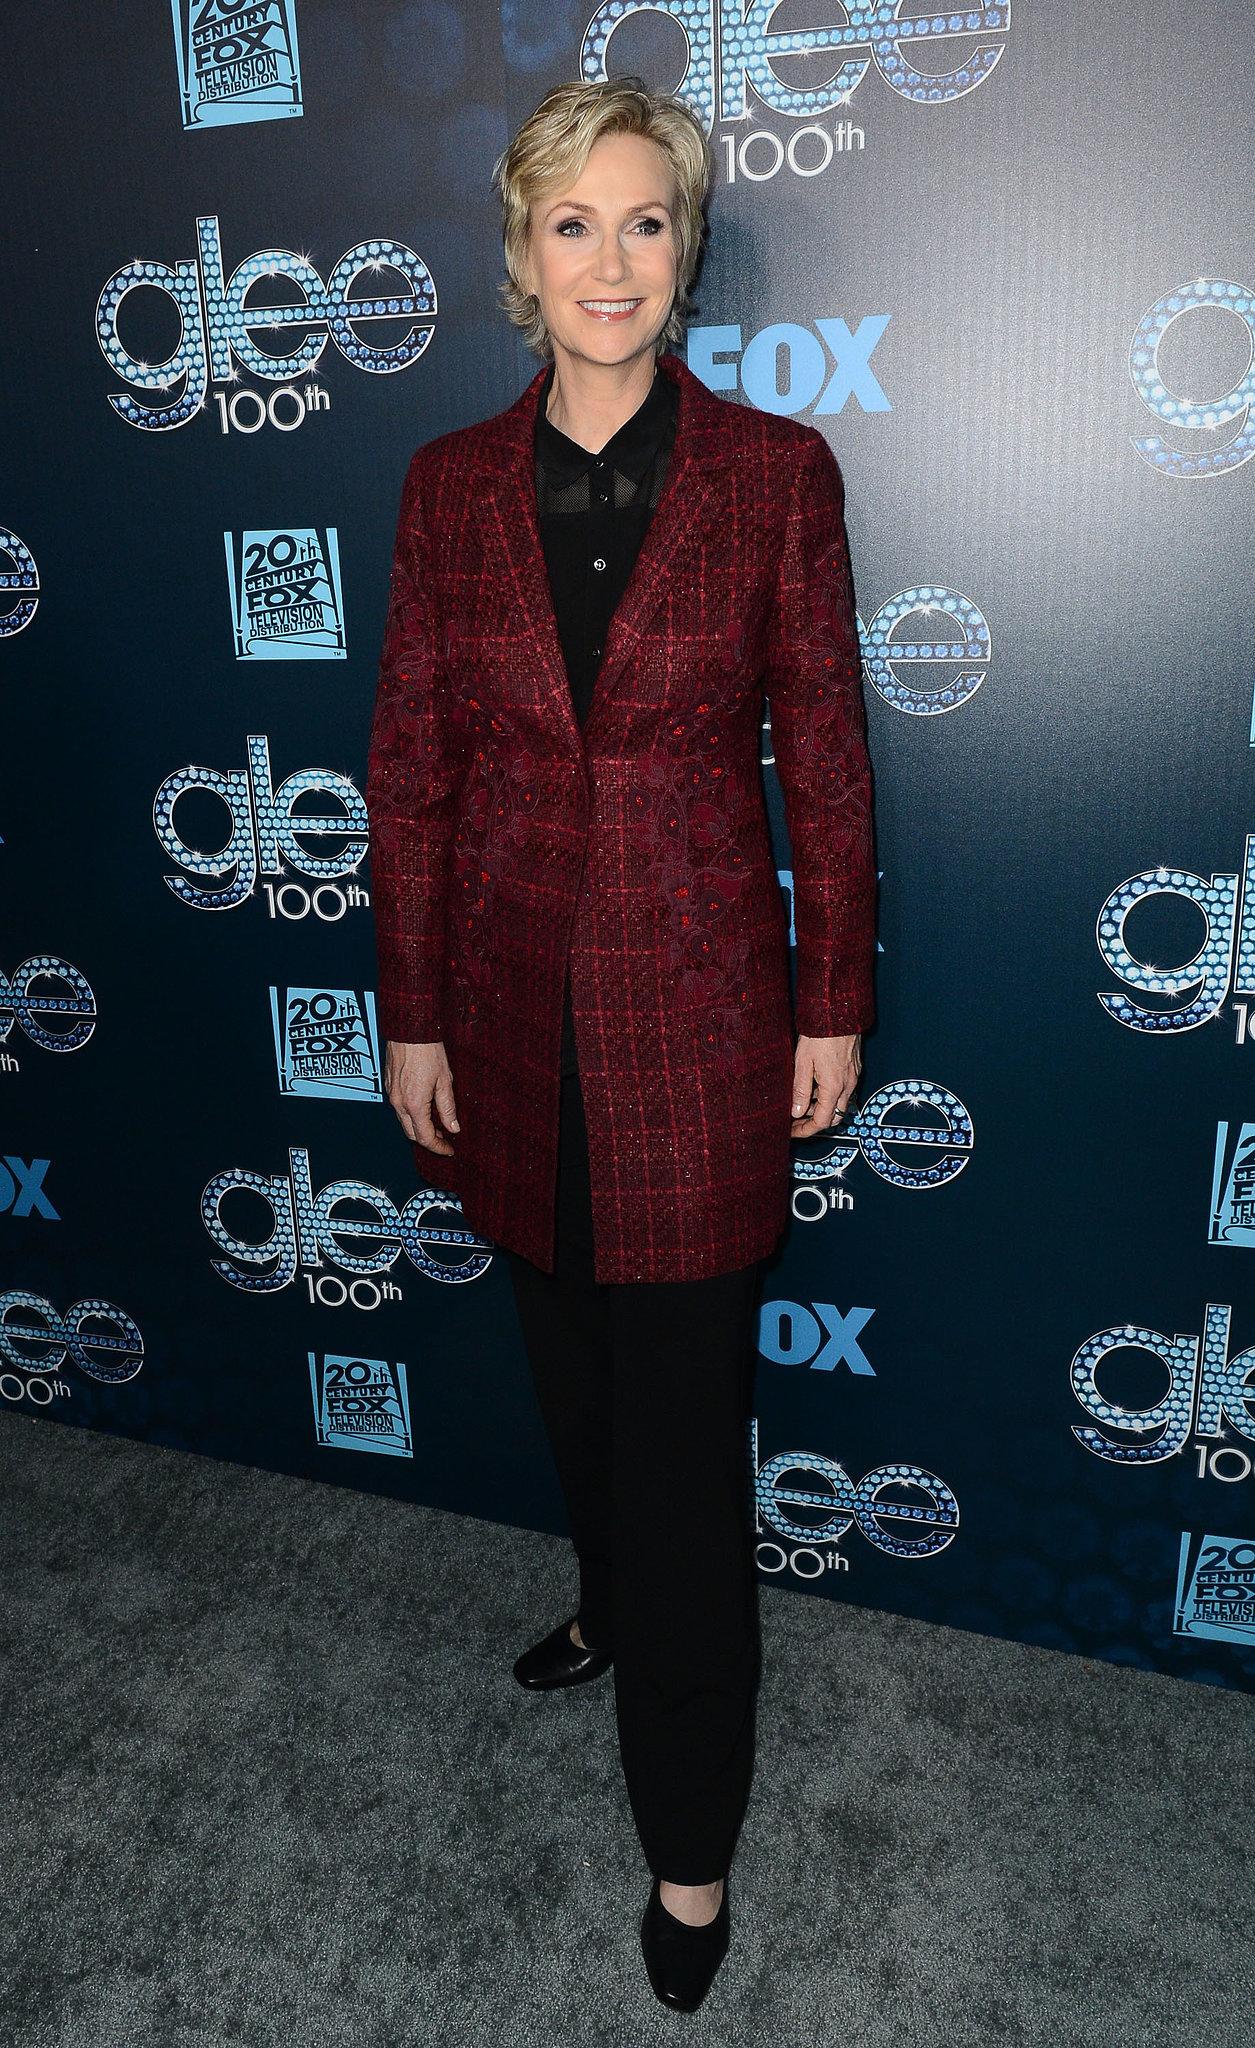 Jane Lynch wore plaid.